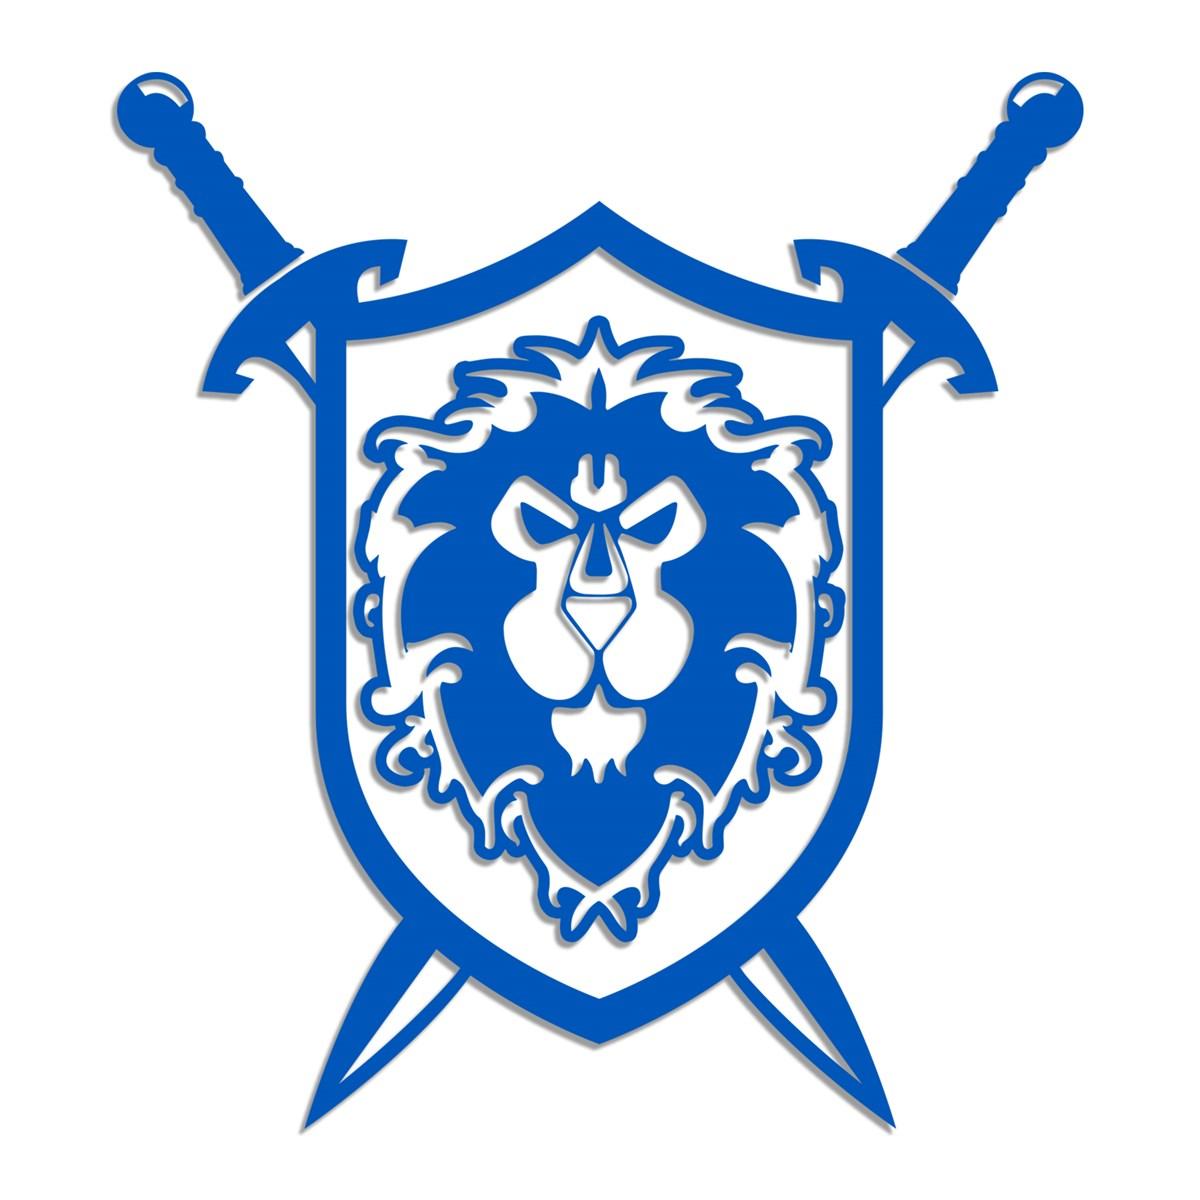 JINX : World of Warcraft Alliance Coat of Arms Vinyl Sticker.